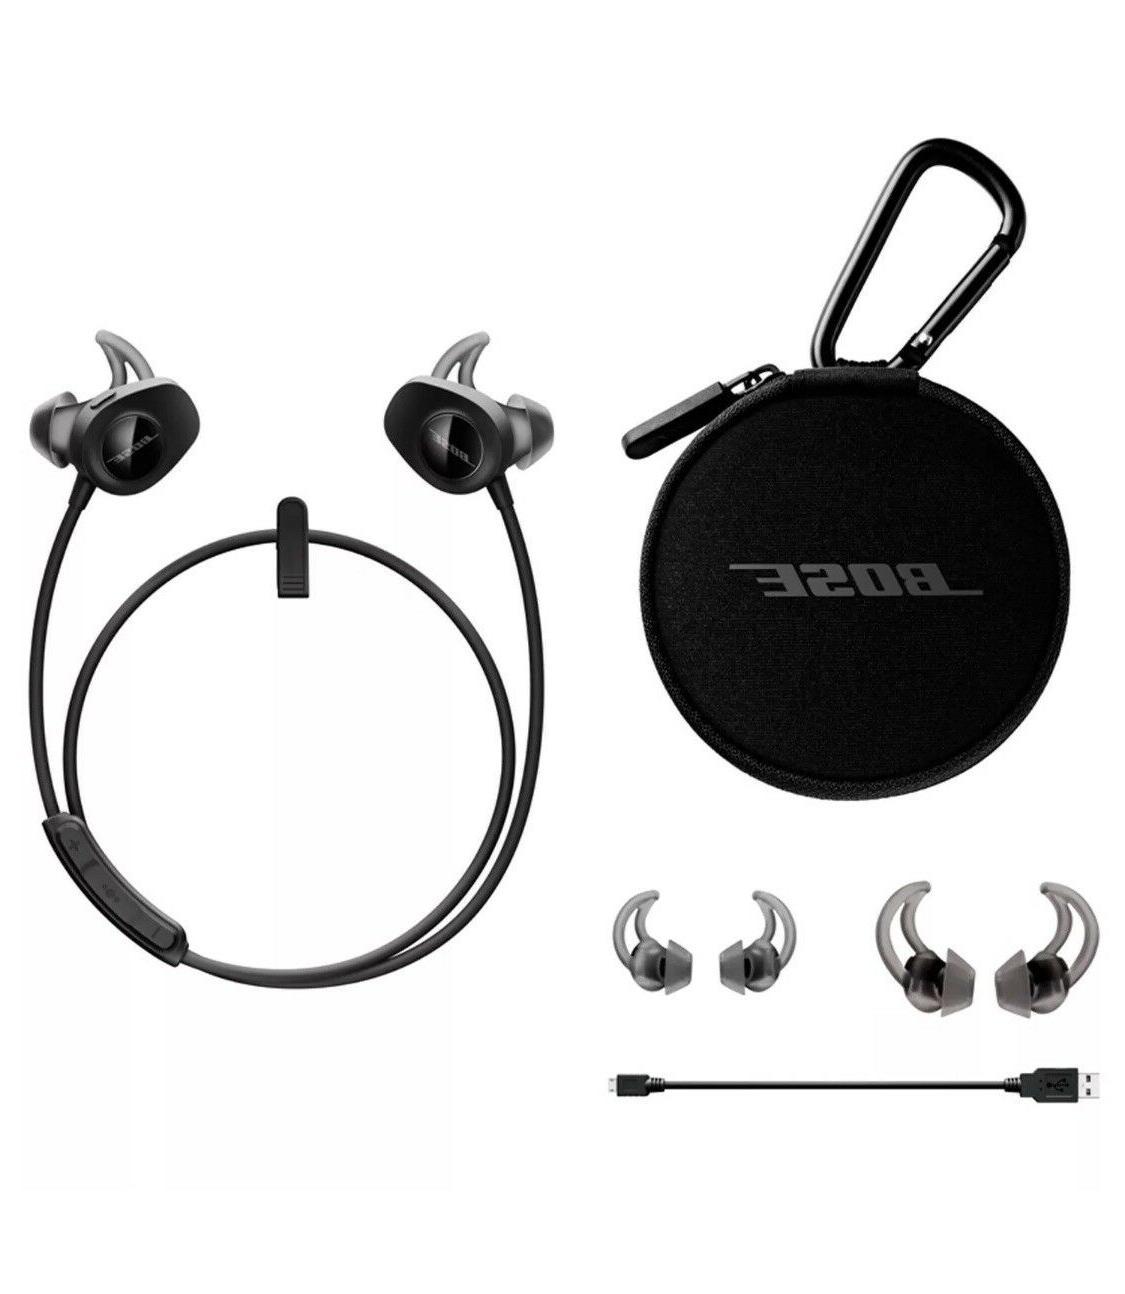 soundsport earbuds wireless bluetooth black factory renewed